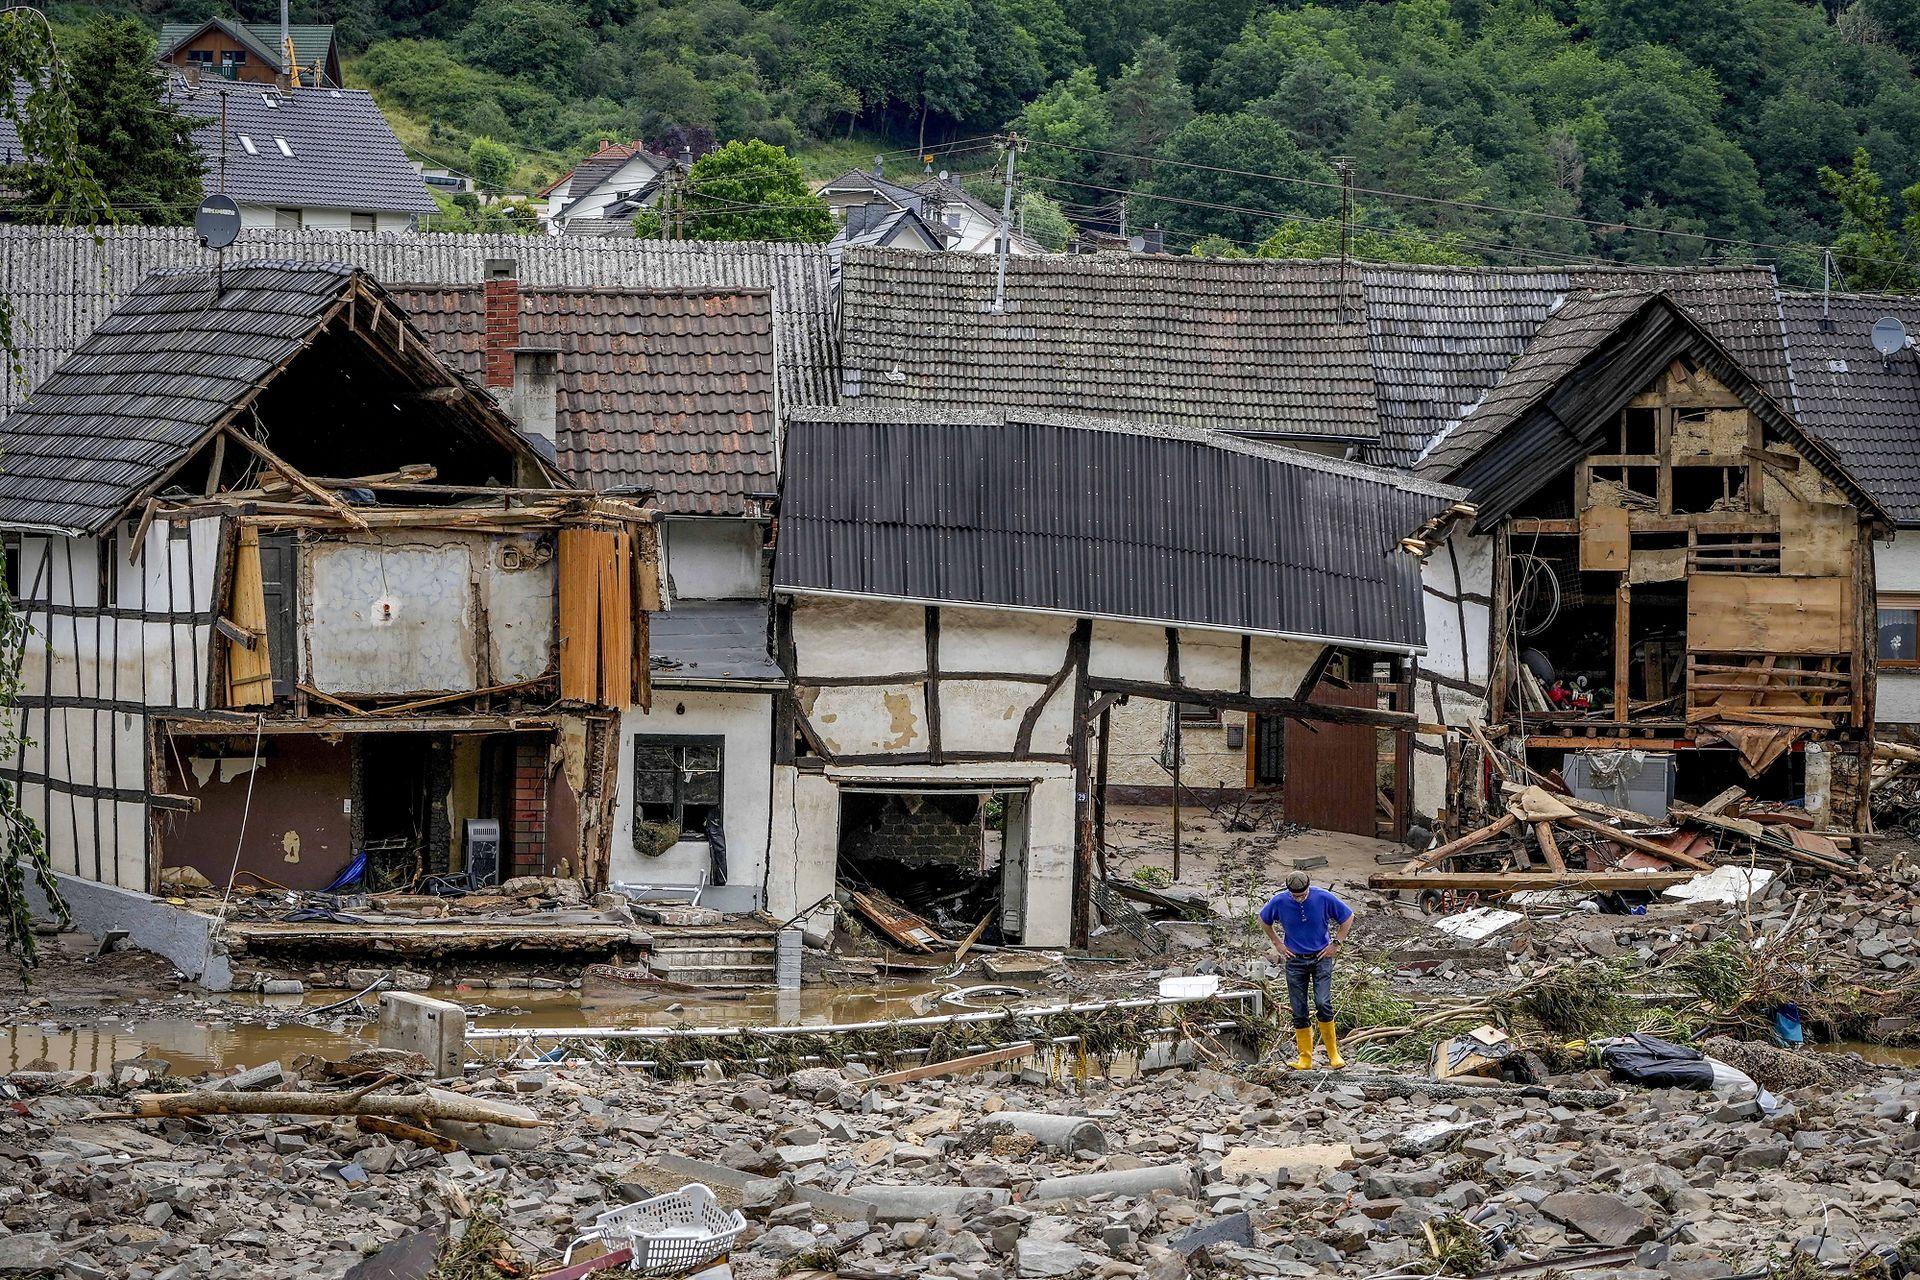 Muchas viviendas quedaron totalmente destruidas